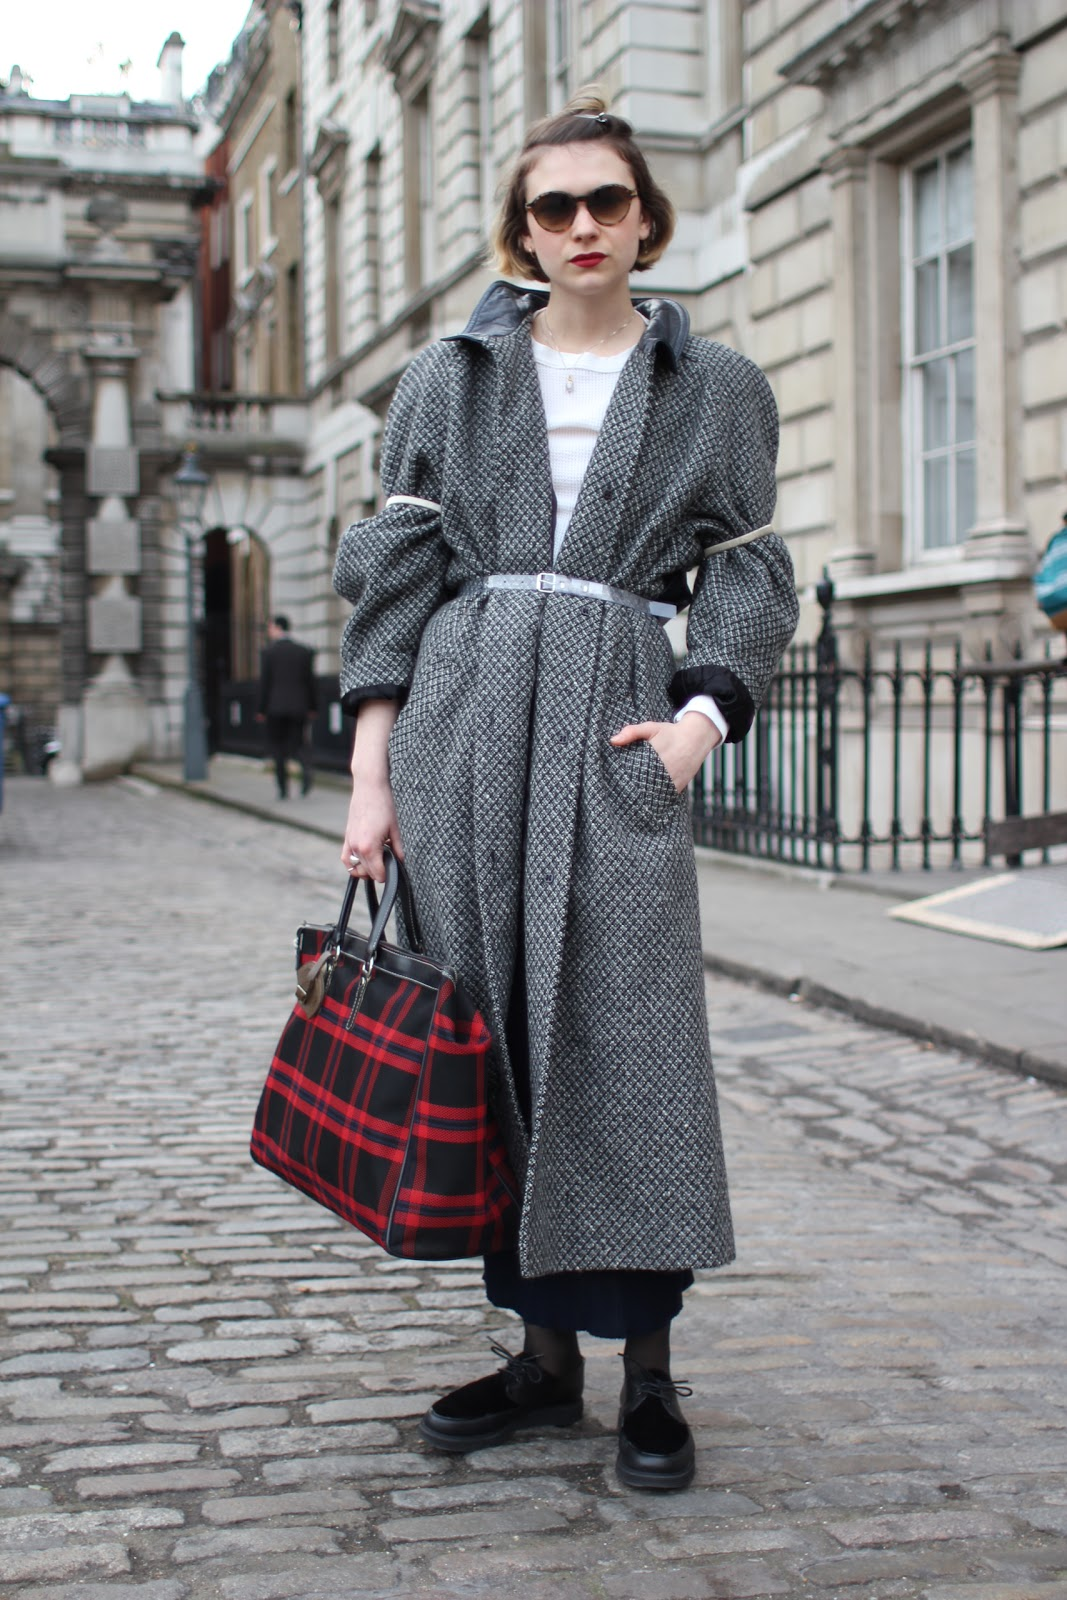 Styleeast London Fashion Week Street Style Chameleon